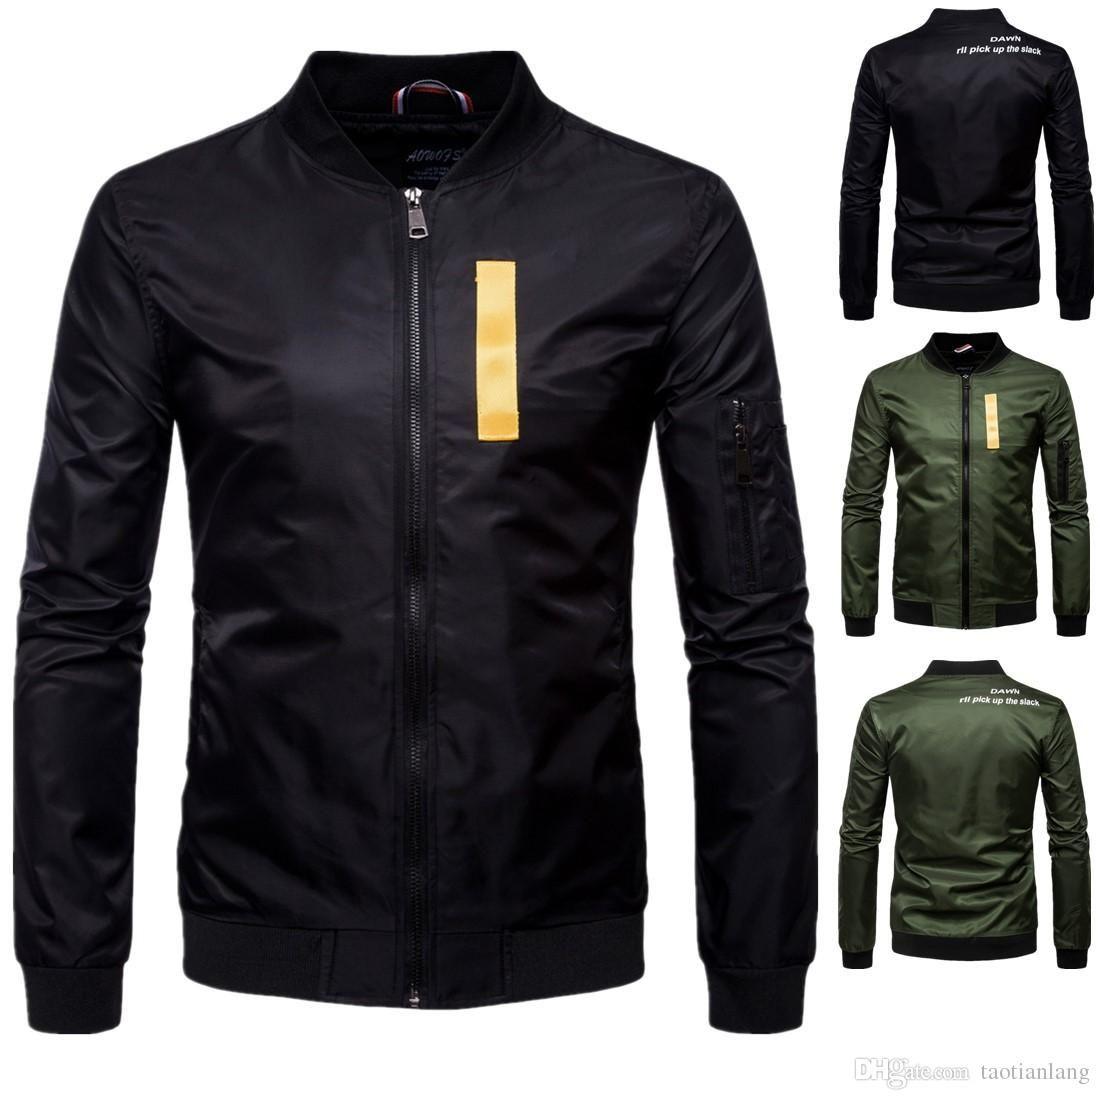 Giacche da baseball da uomo autunno moda cappotti maschili casual slim bomber giacca volanti tuta sportiva hip hop giacche uomo t170715